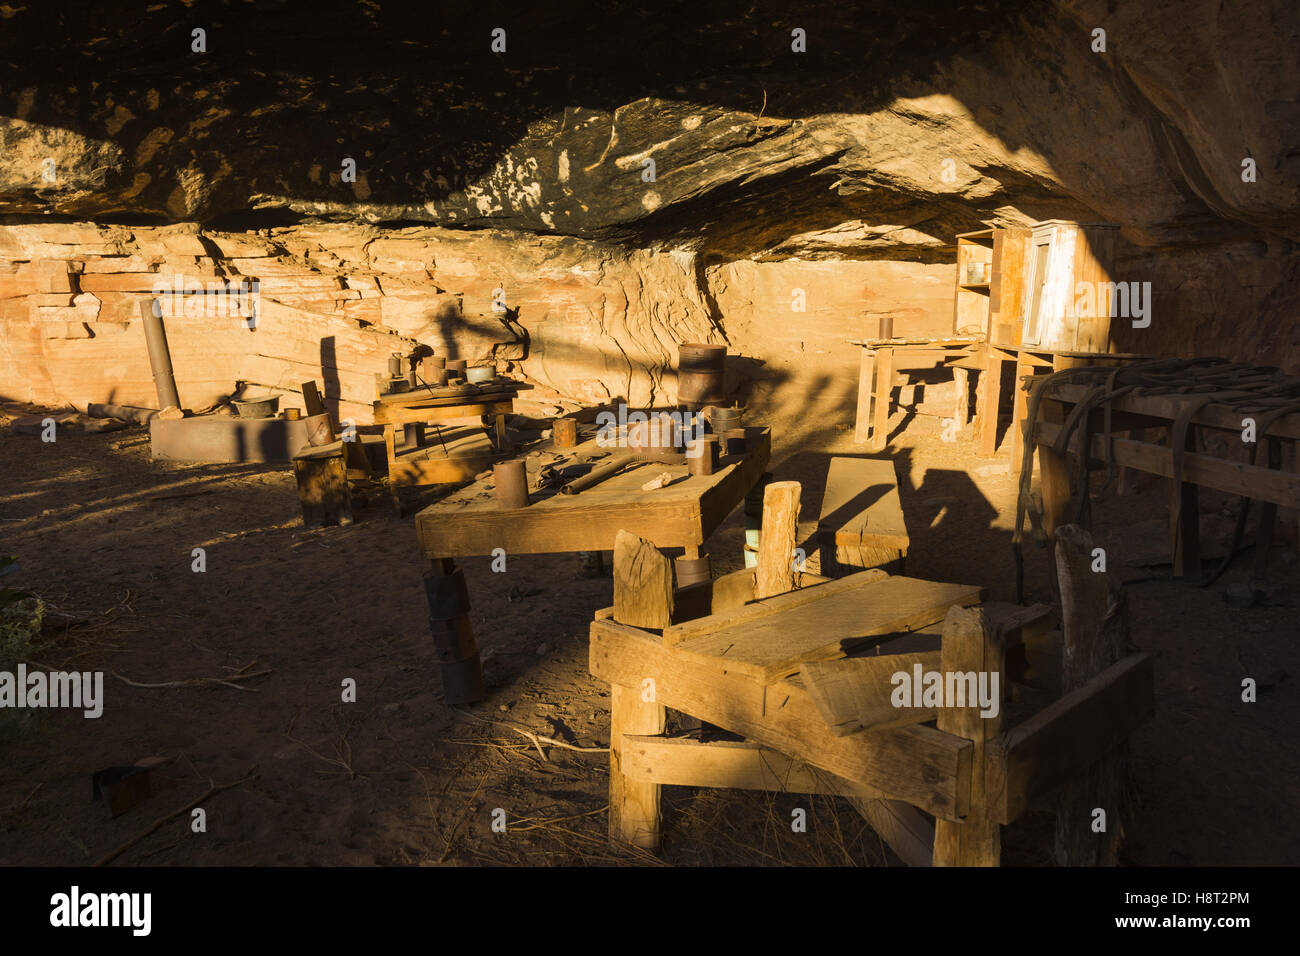 Utah, Canyonlands National Park, Needles District, Cave Spring Cowboy Camp - Stock Image